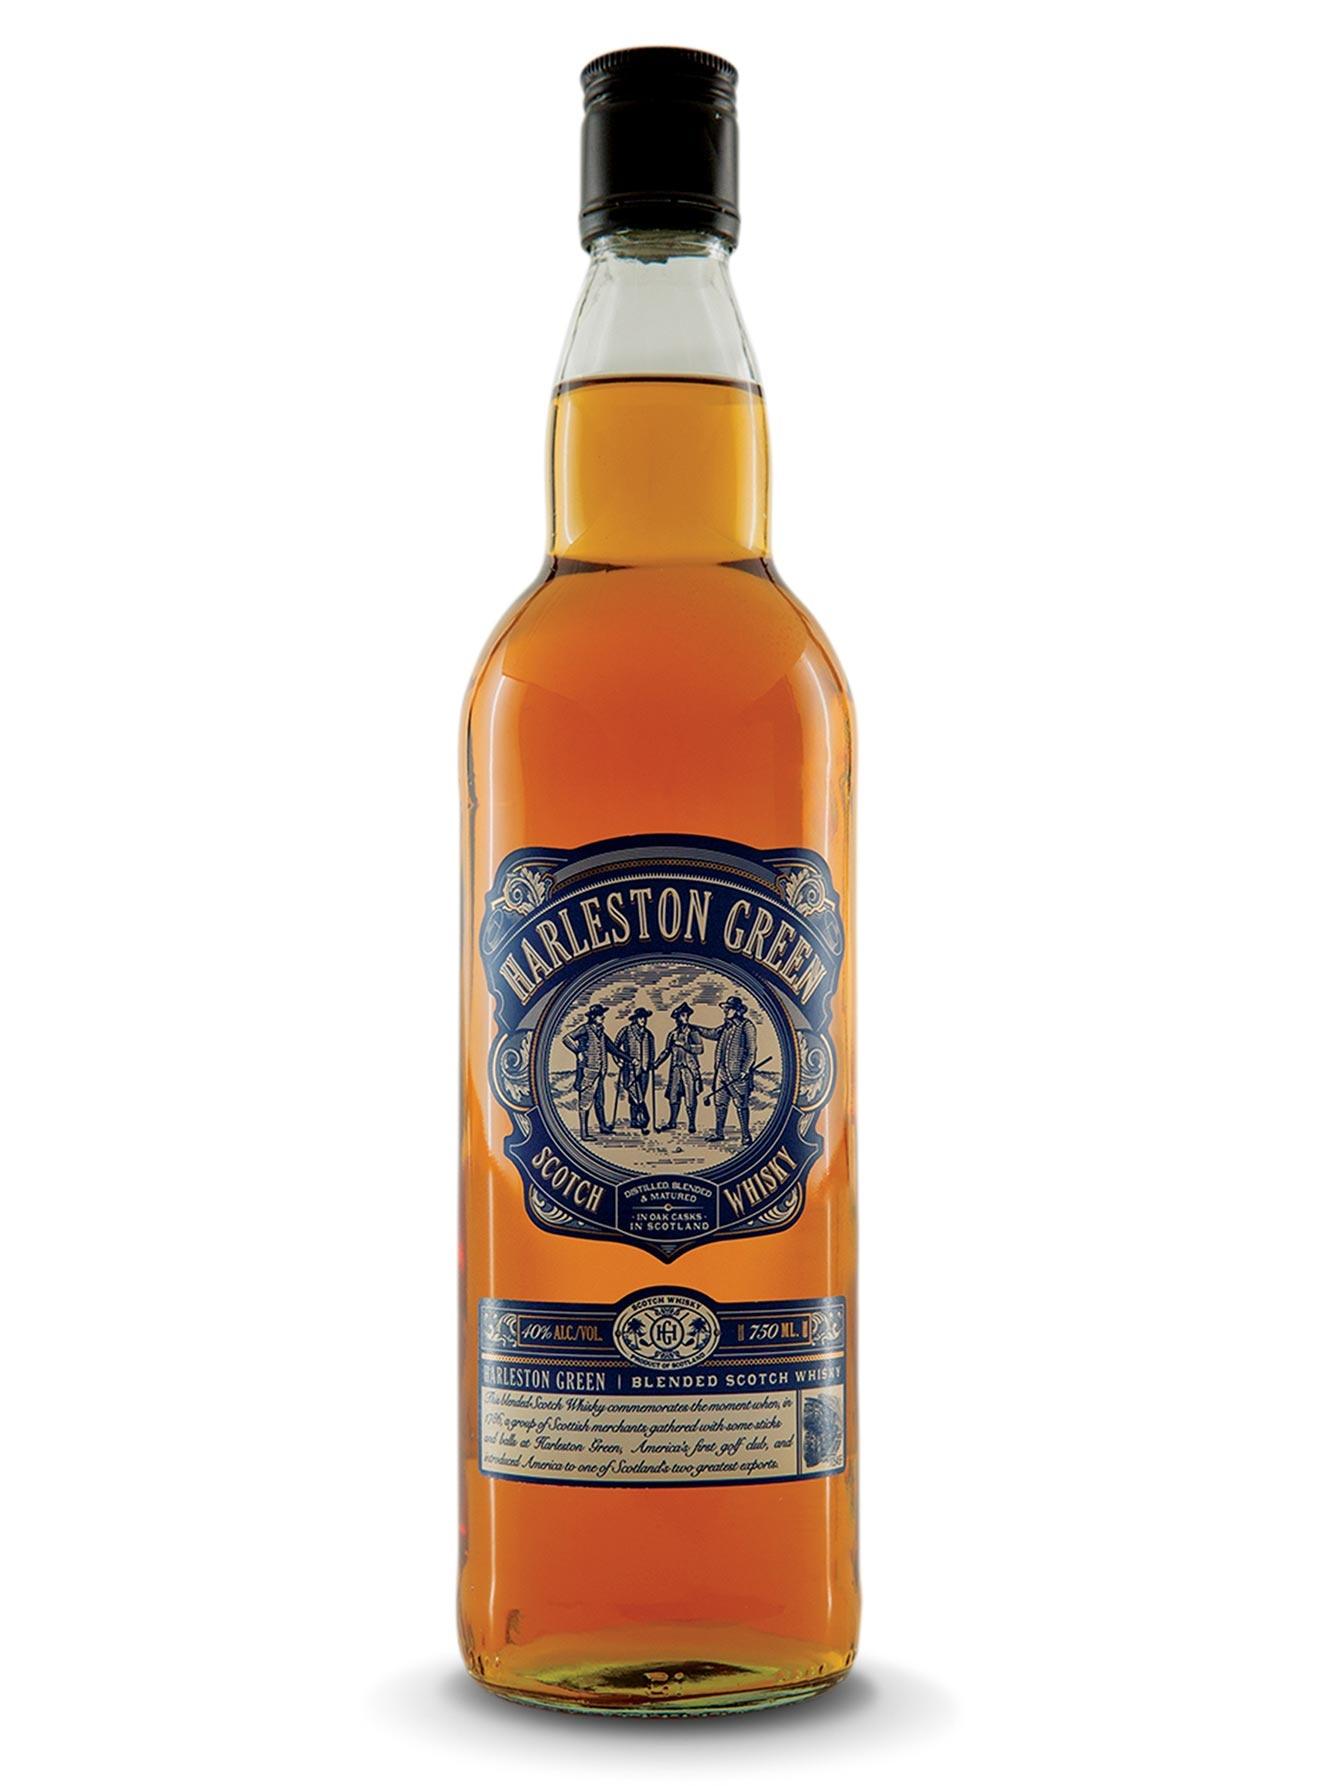 Harleston Green Blended Scotch Whisky 750ml